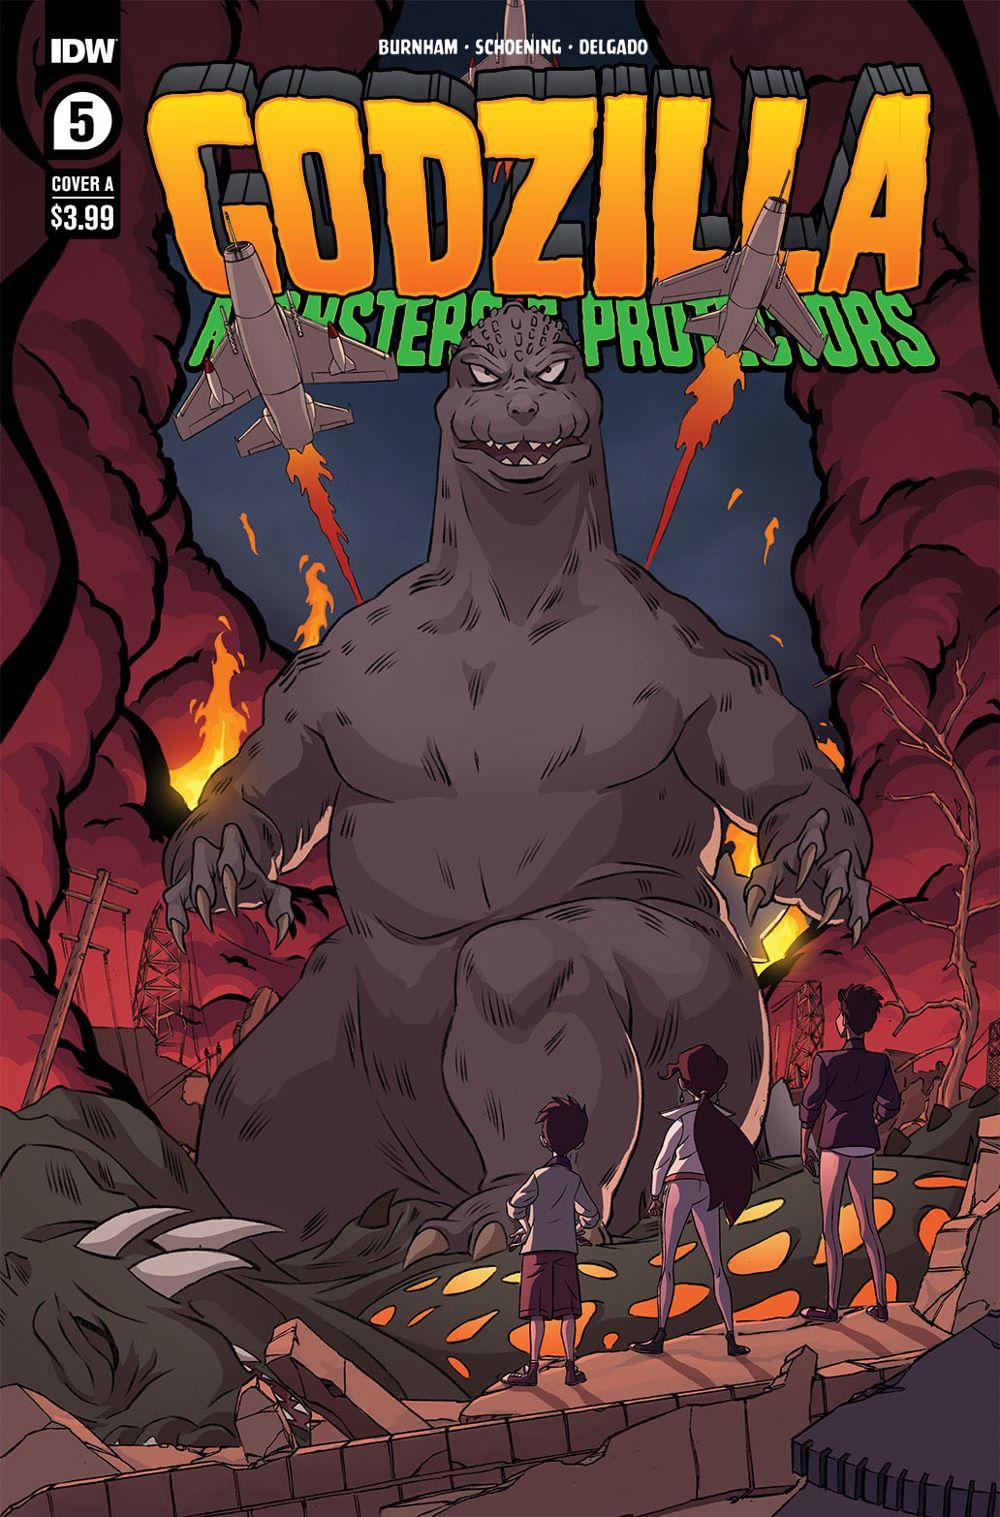 Godzilla_MP05-coverA-copy IDW Publishing August 2021 Solicitations